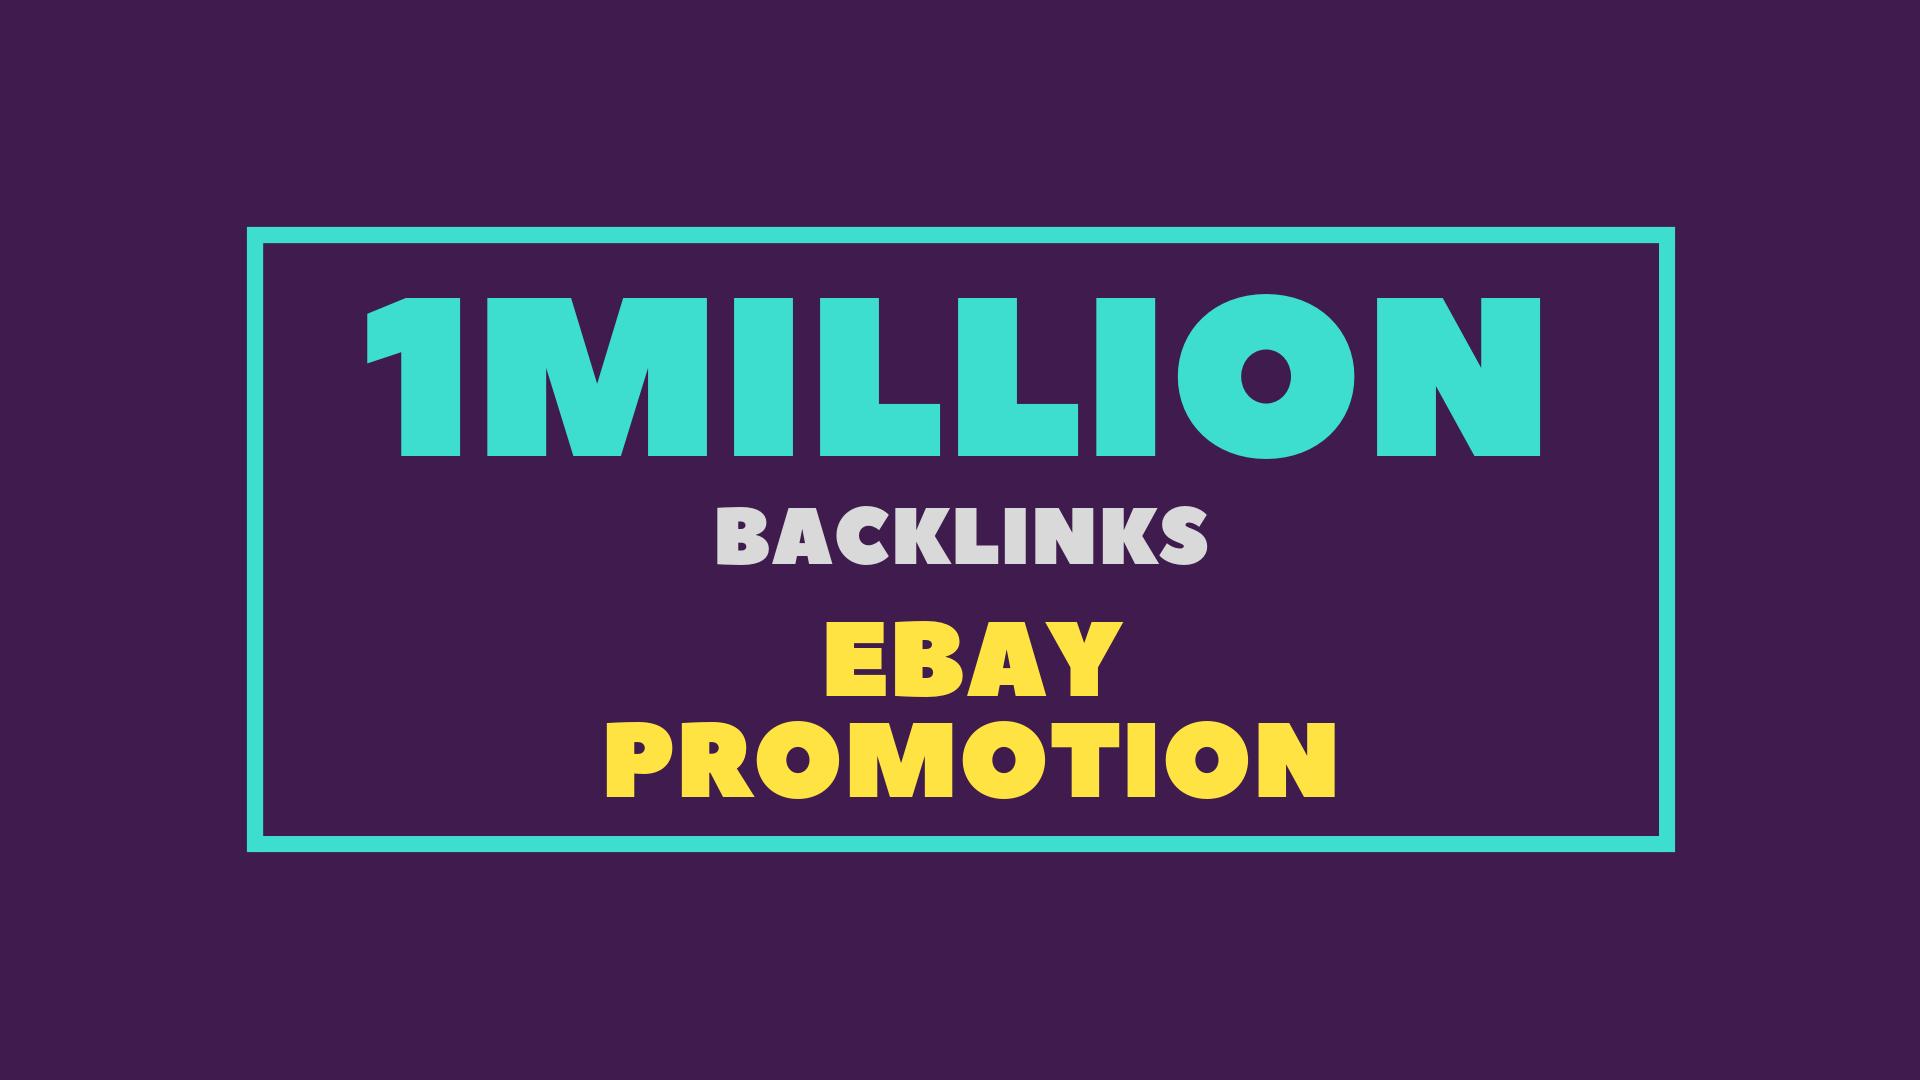 Promote your ebay store with 1 million dofollow gsa SEO backlinks